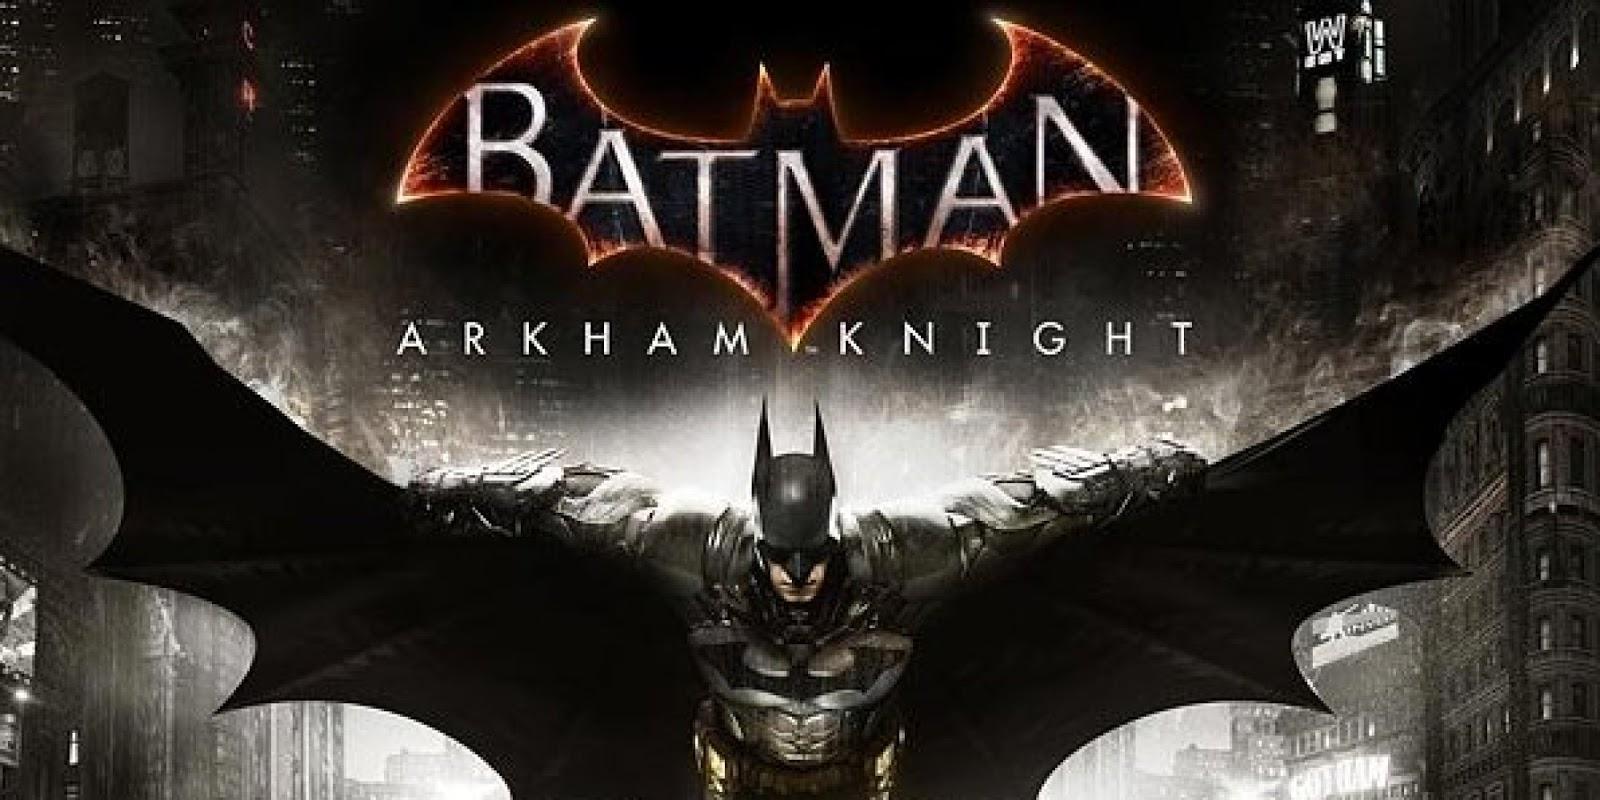 العاب باتمان العاب باتمان